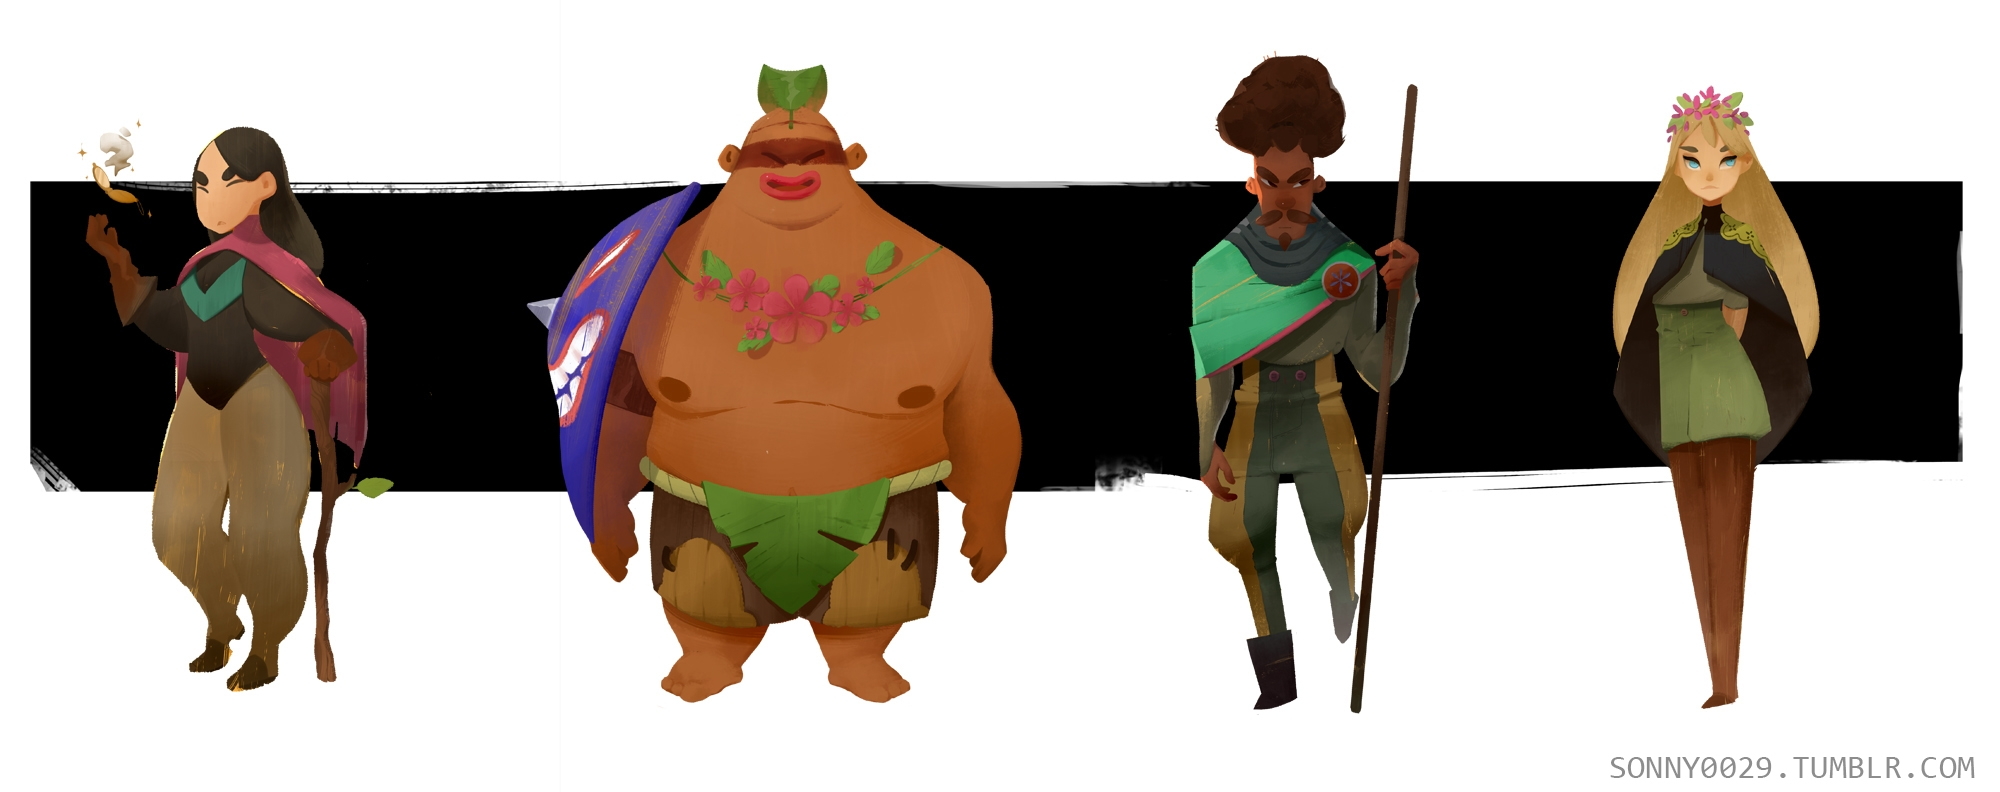 Characters - characterdesign, character - sonny-2874 | ello